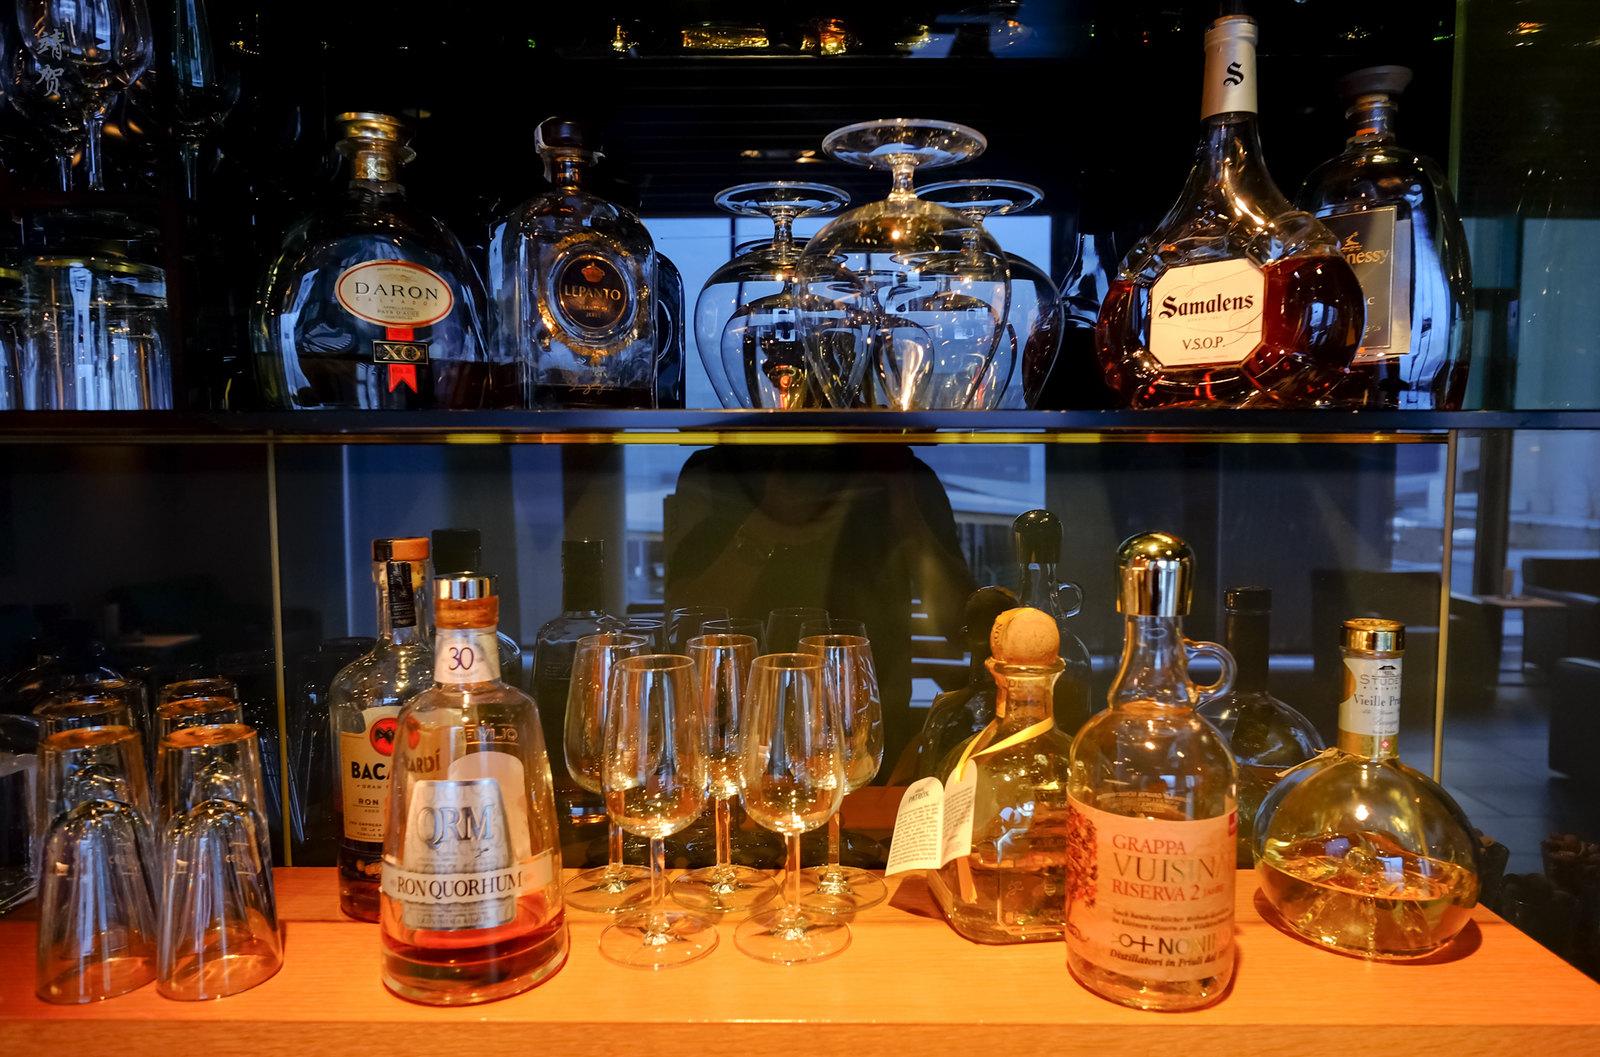 Cognac and fine liquor